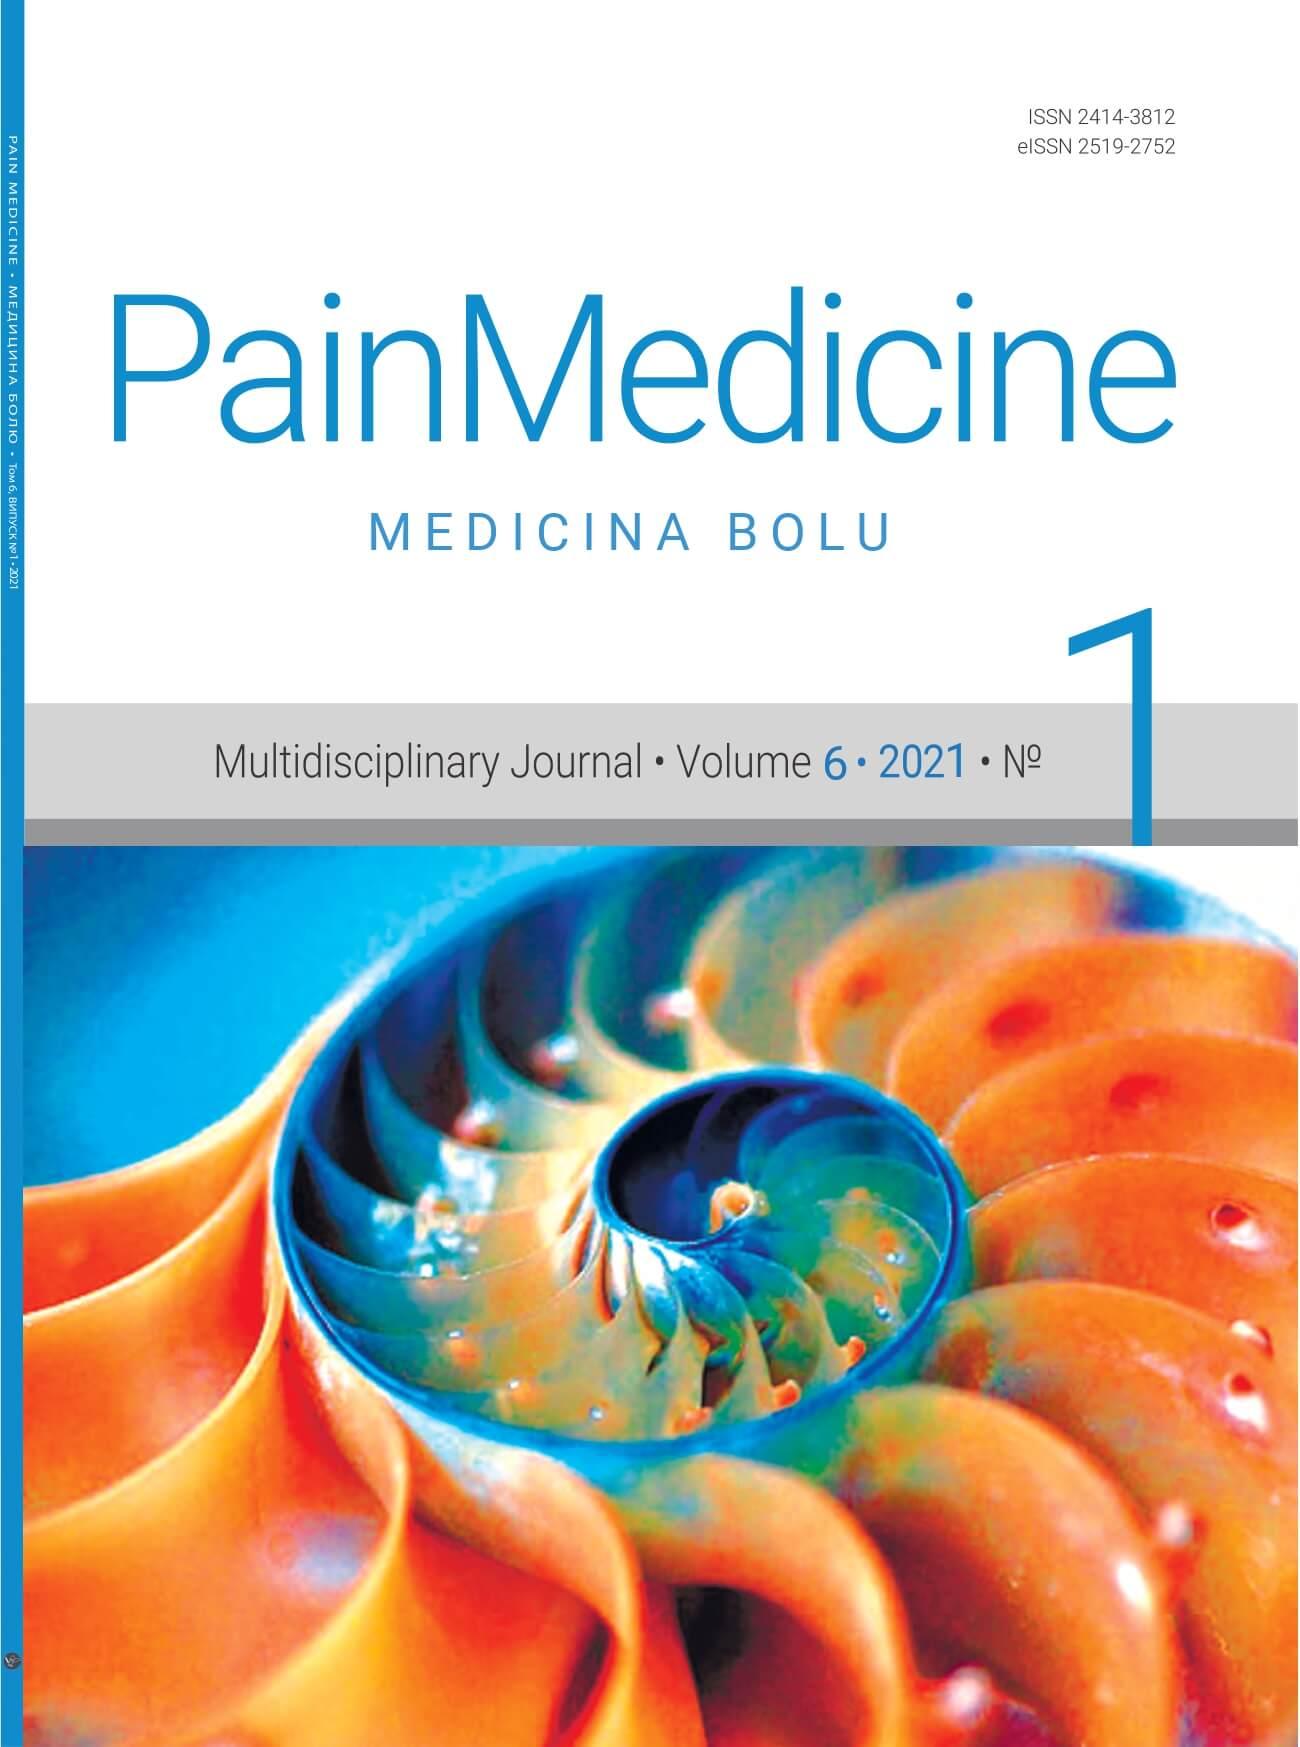 Pain Medicine 2021 Volume 6, #1